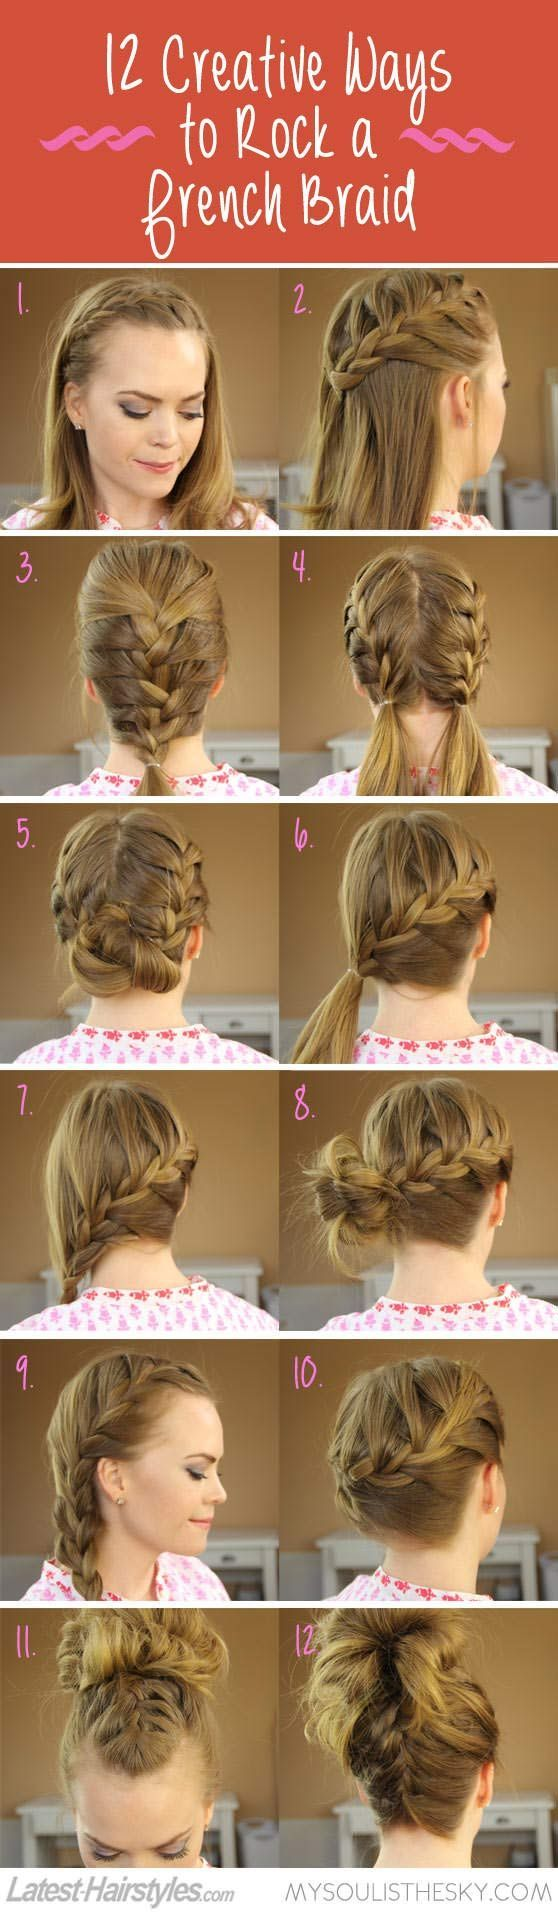 9 Ways To Do A French Braid   Hair styles, Easy french braid ...